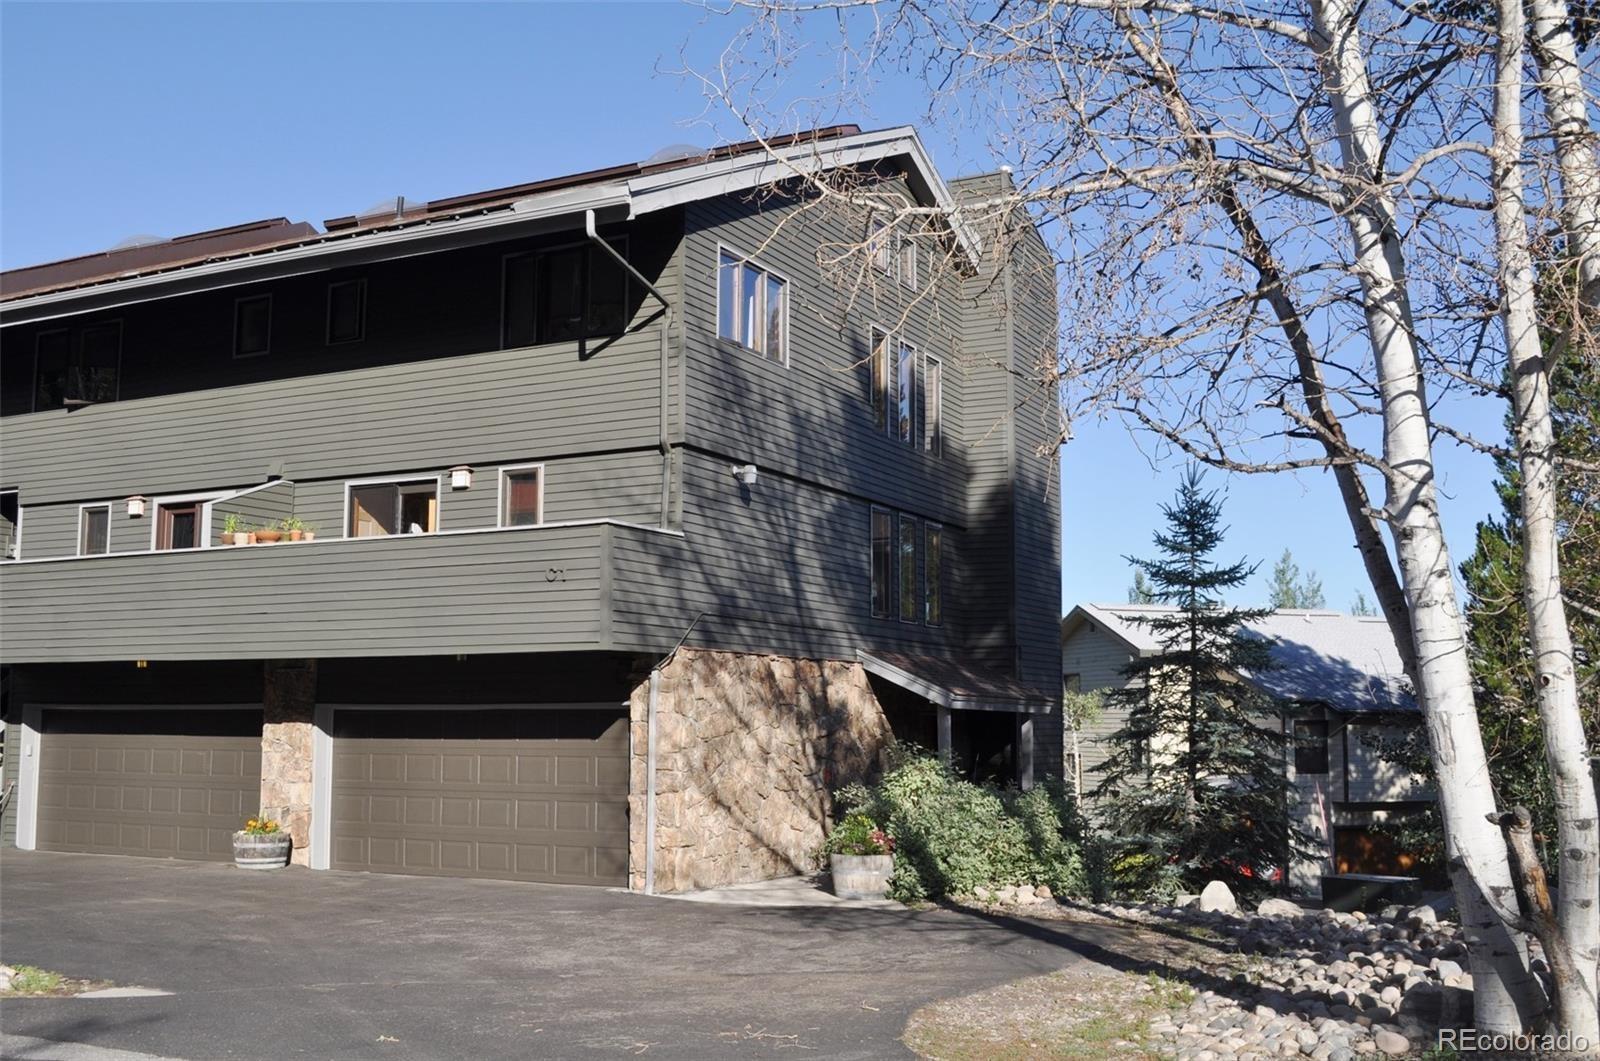 MLS# 2309963 - 3 - 1145 Overlook Drive #C1, Steamboat Springs, CO 80487